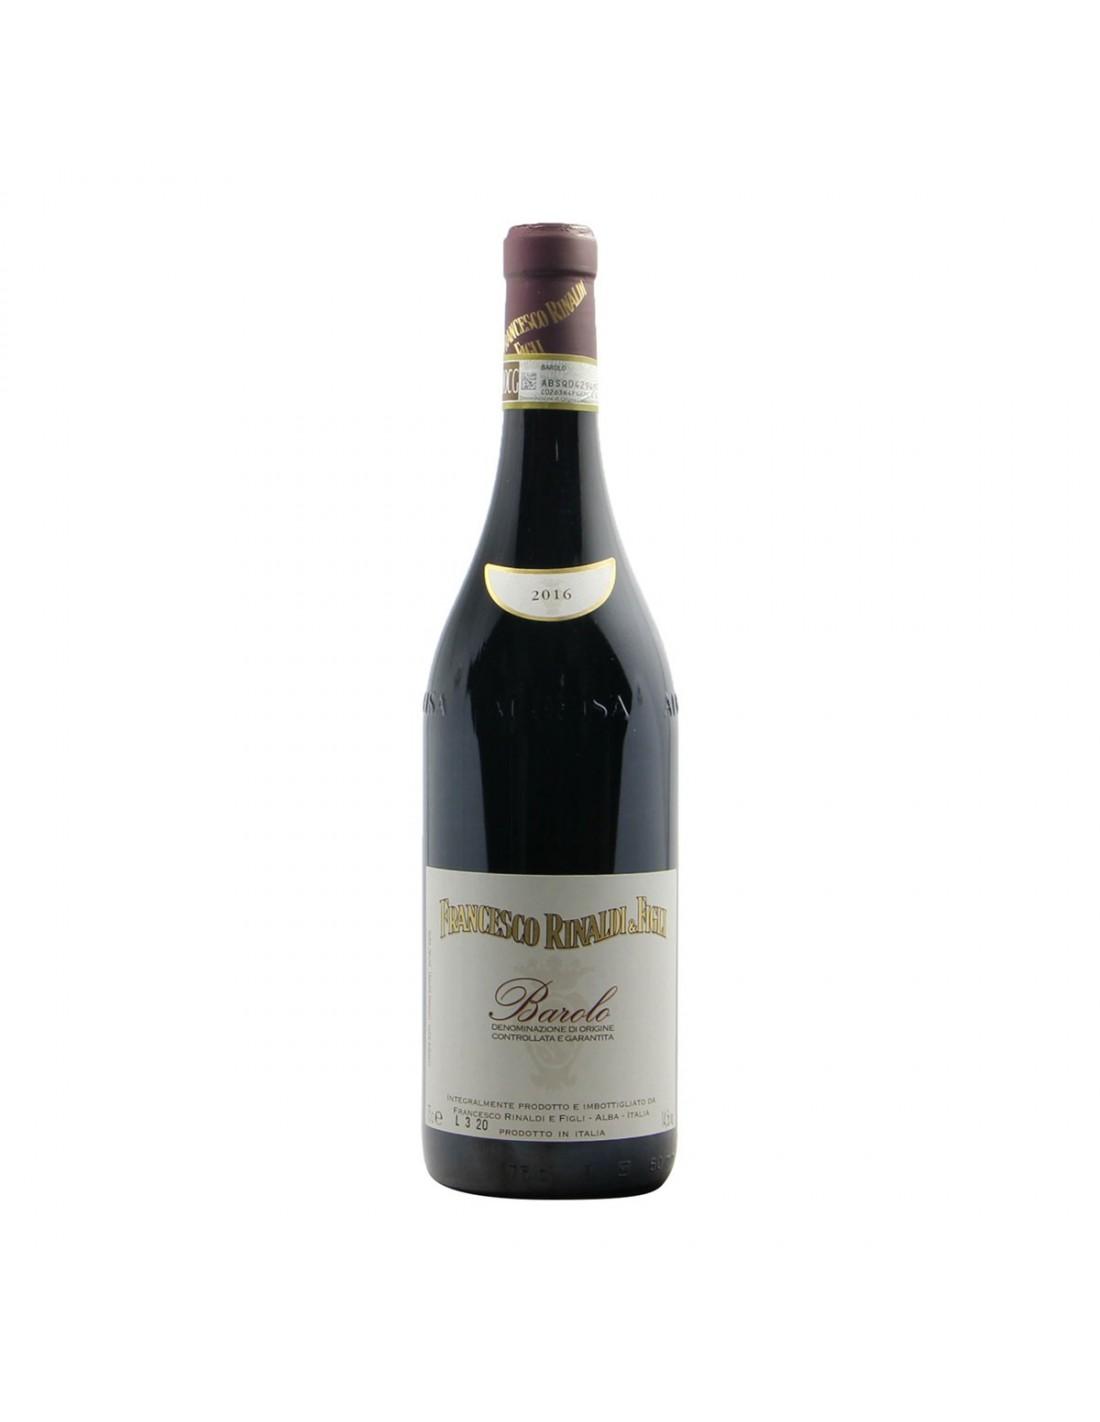 Francesco Rinaldi Barolo 2016 Grandi Bottiglie